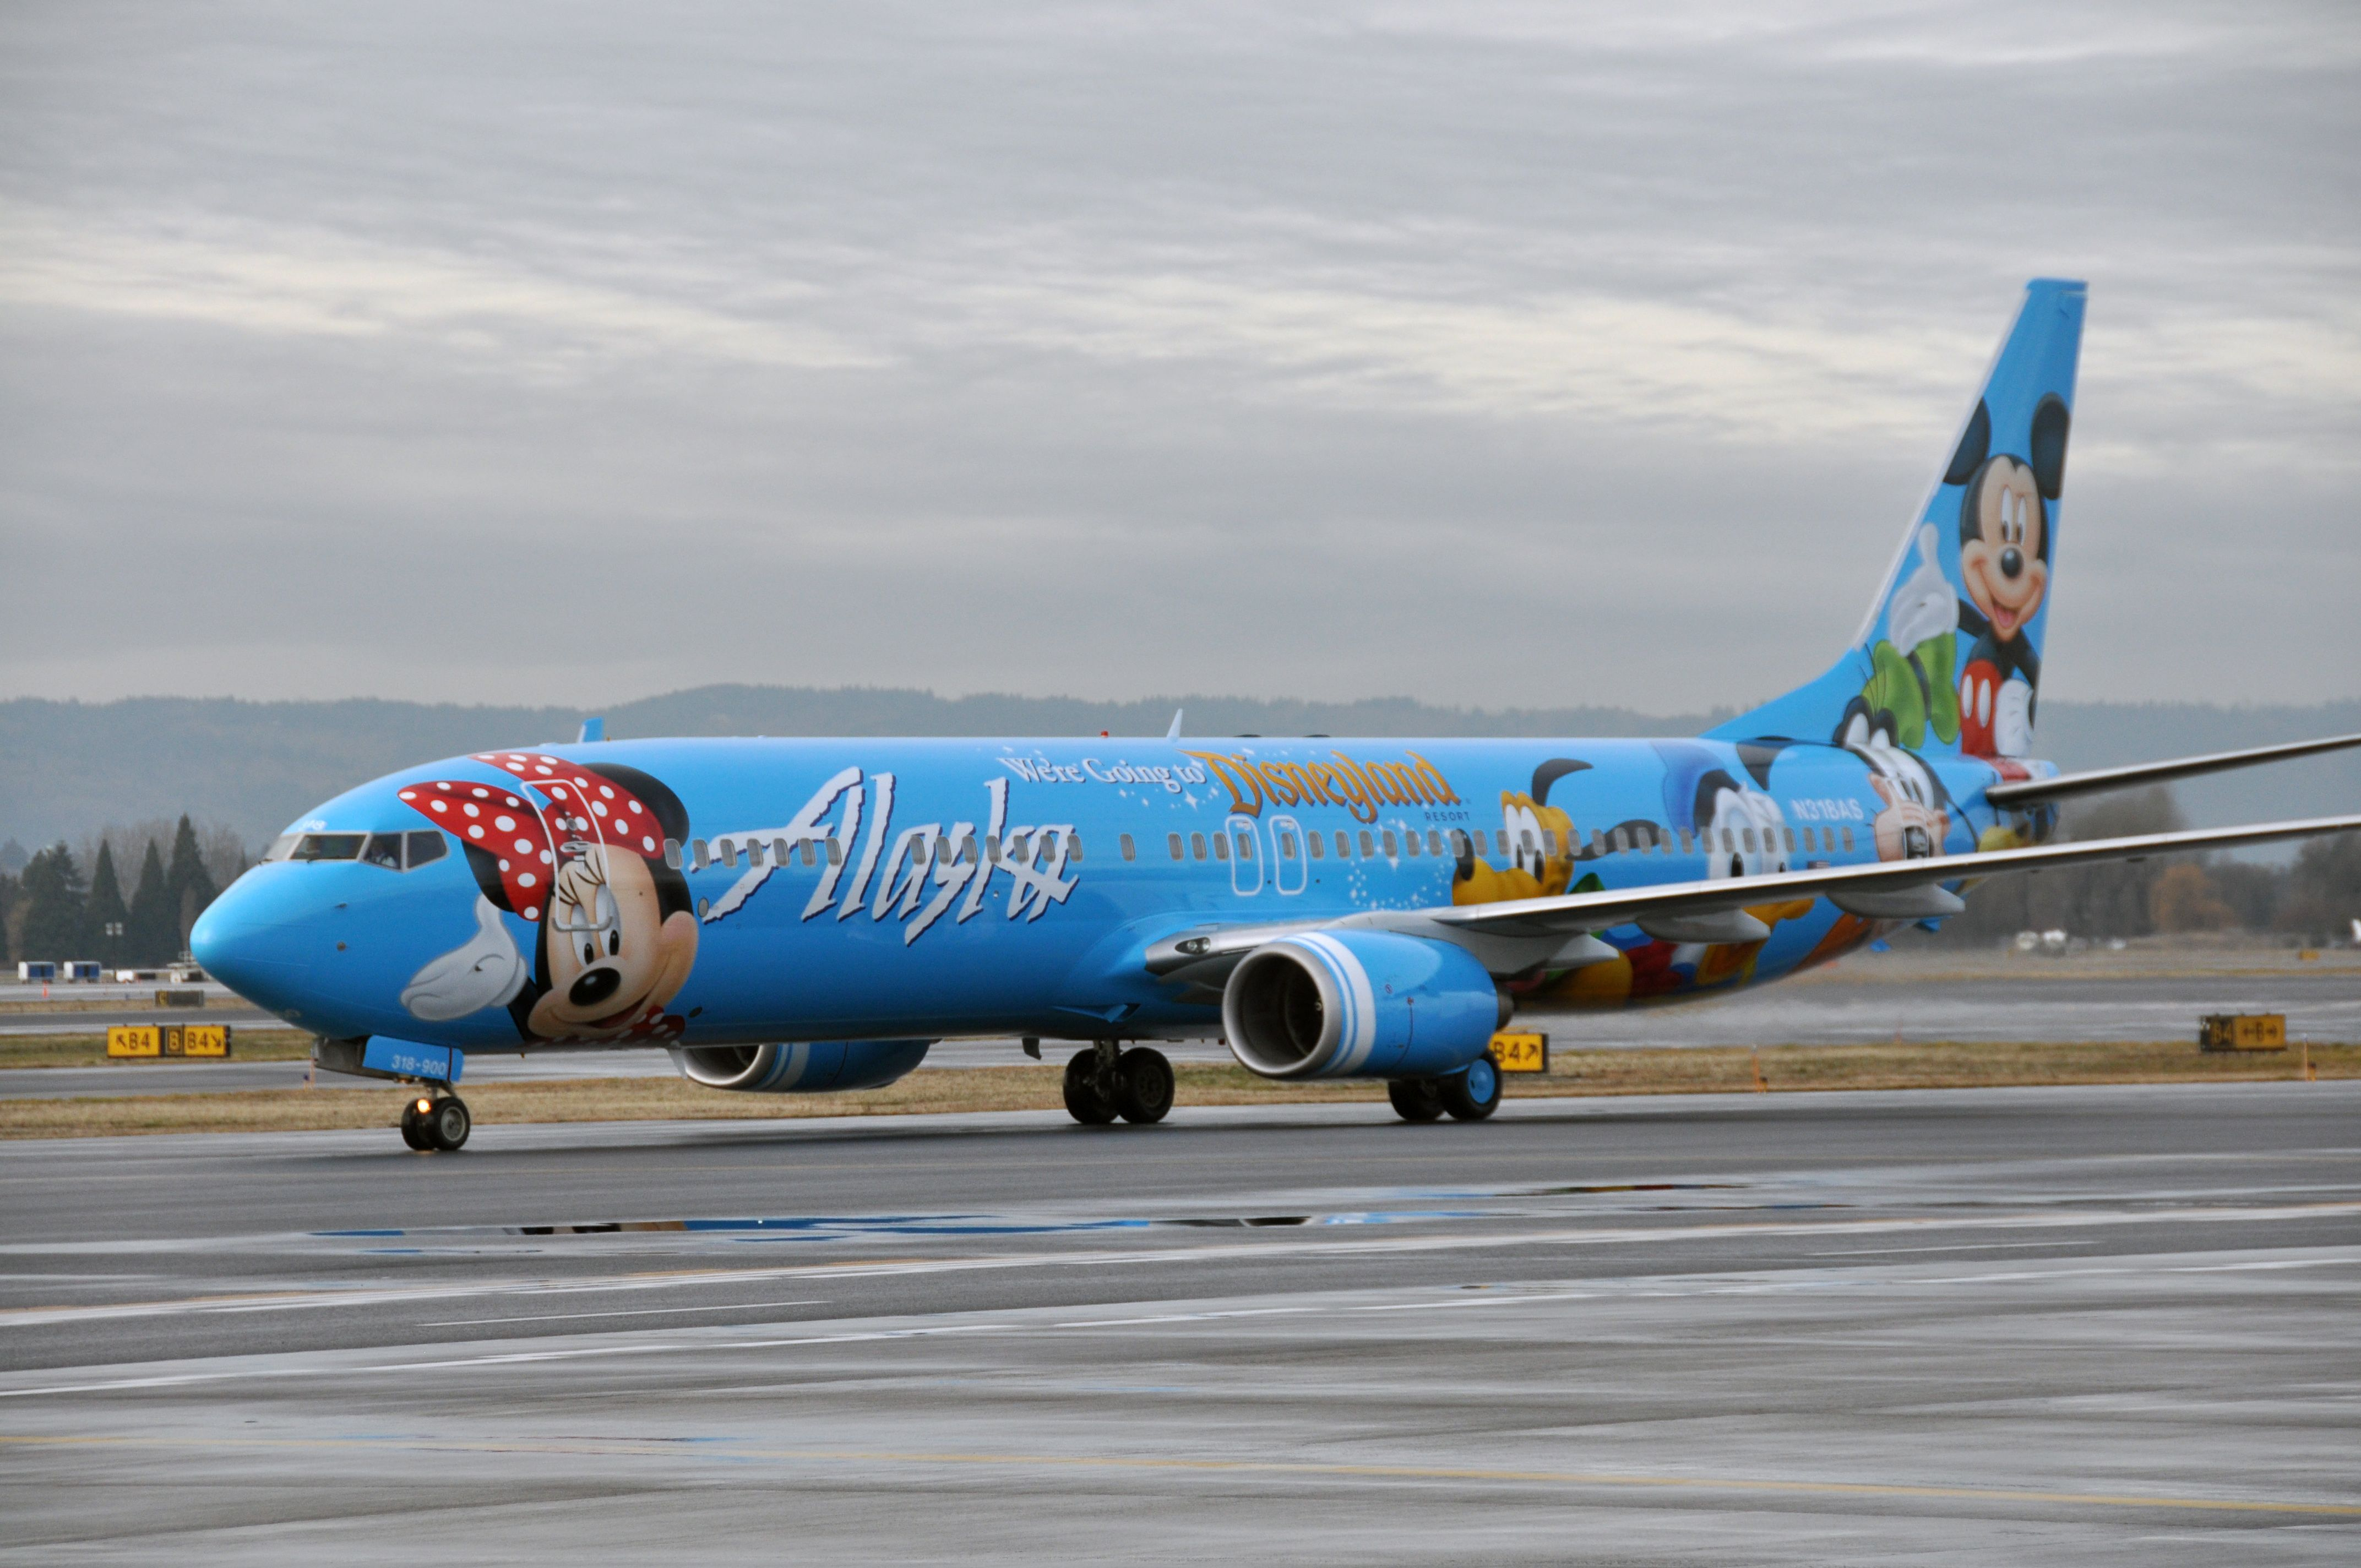 Alaska Airlines Disneyland jet. Photo from AirlineReporter